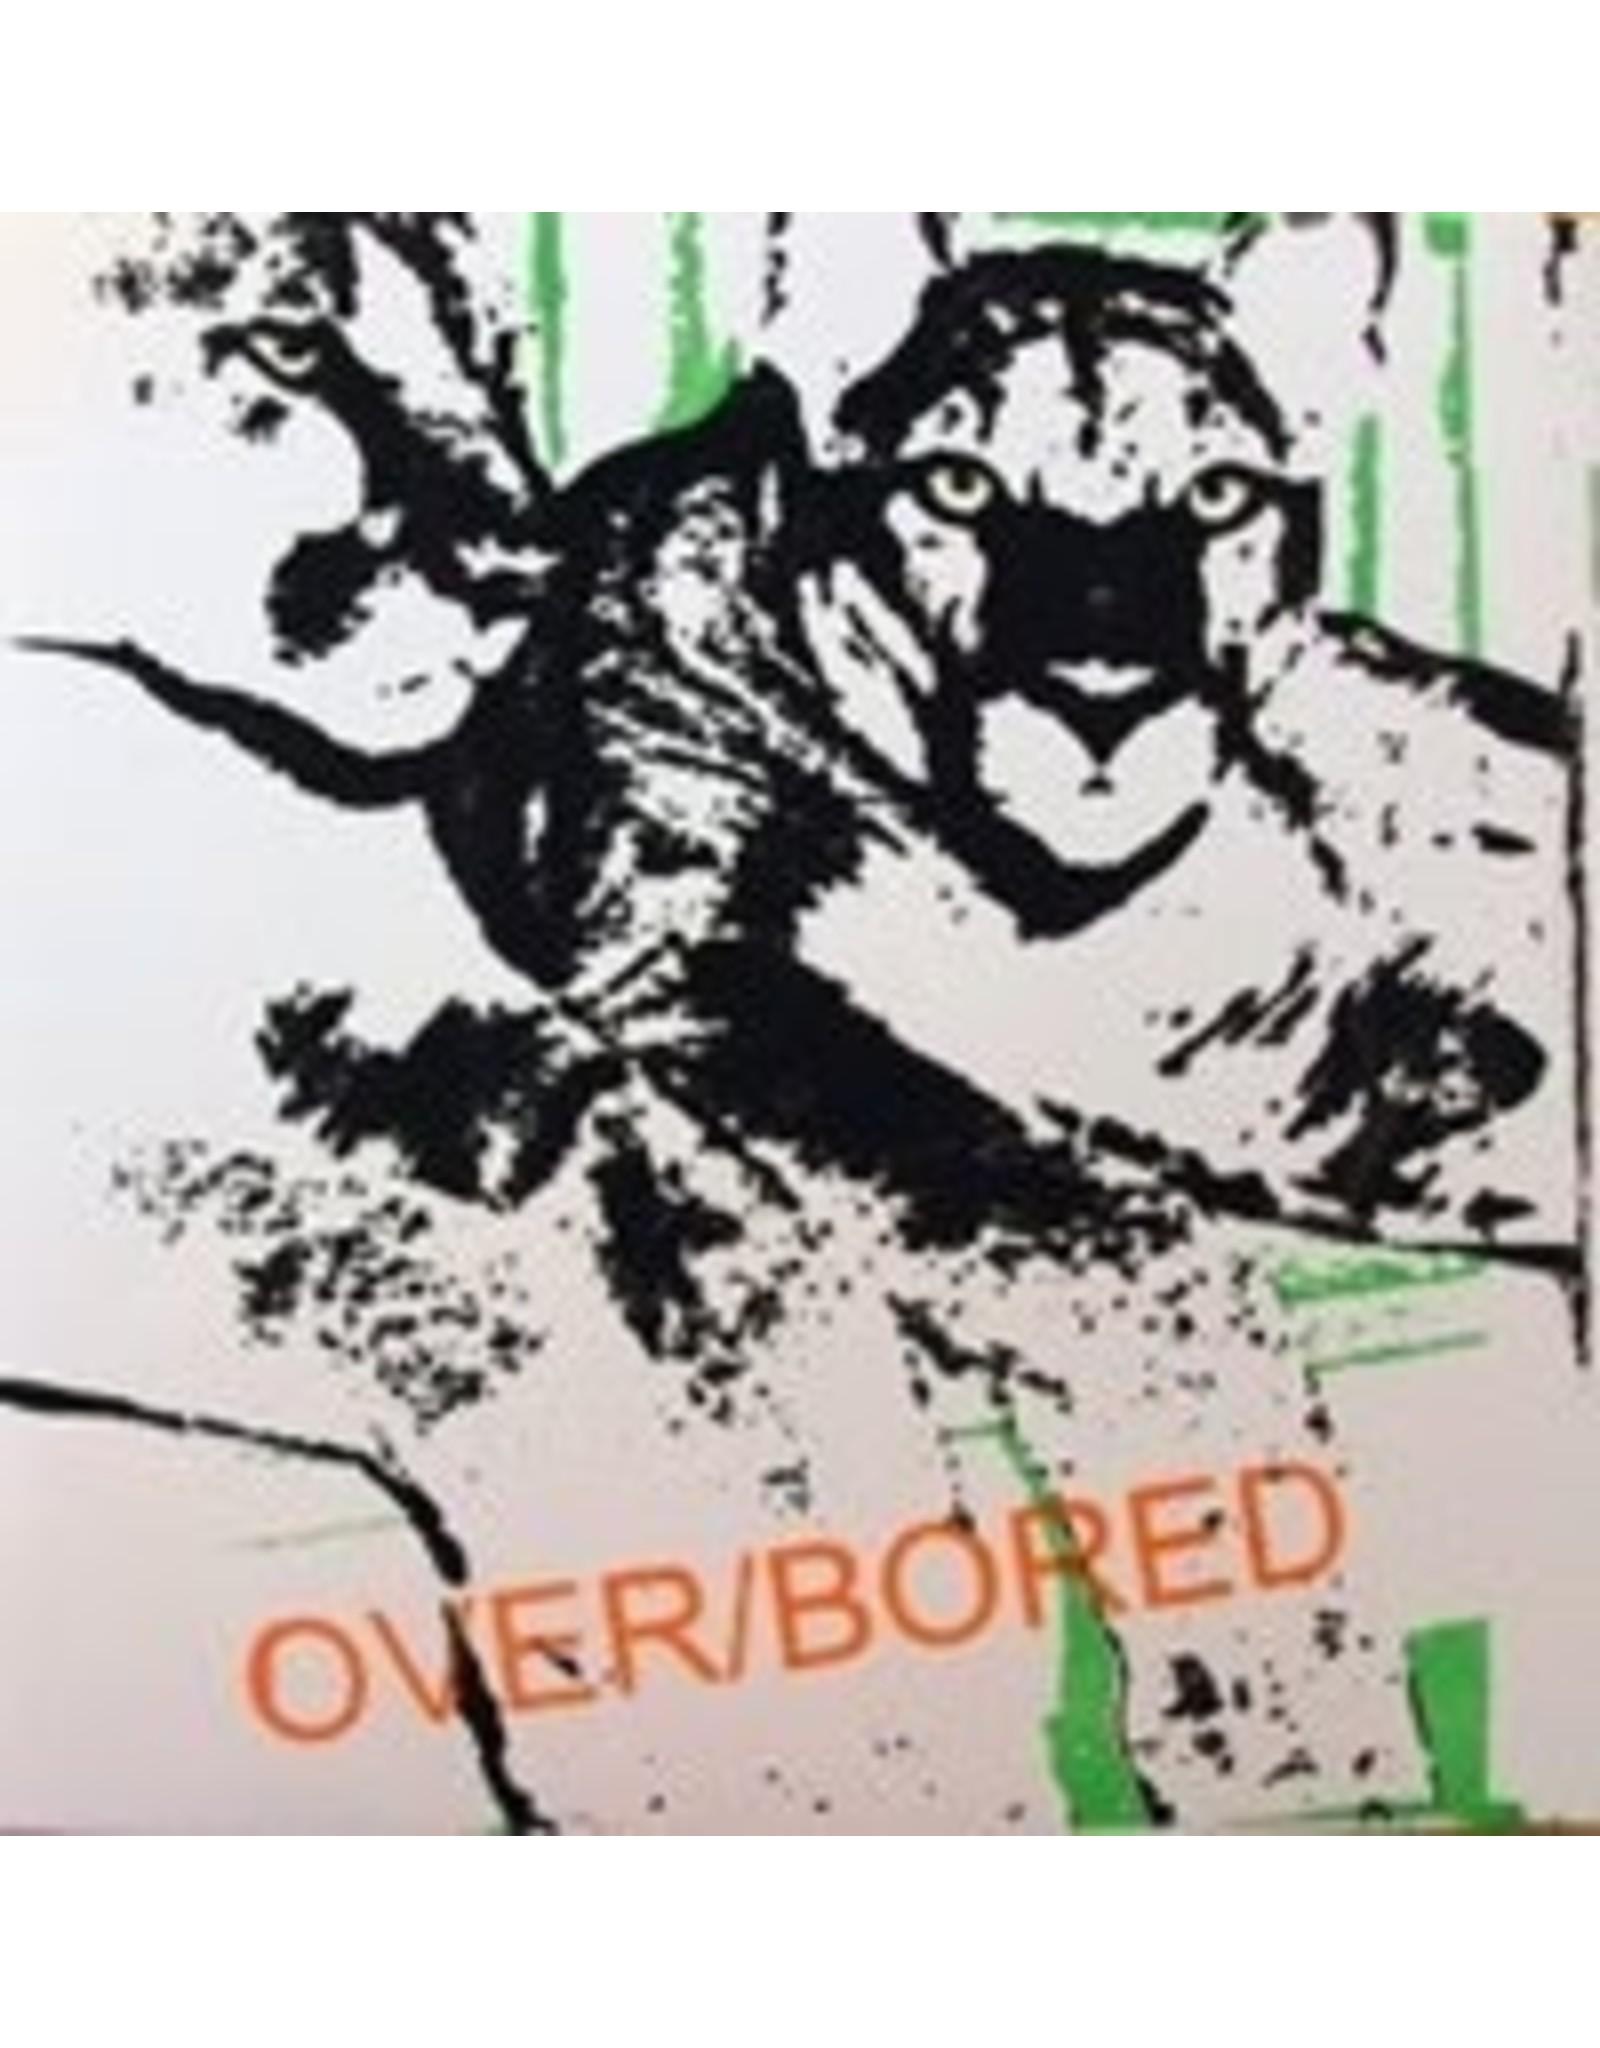 New Vinyl Various - OVER/BORED LP